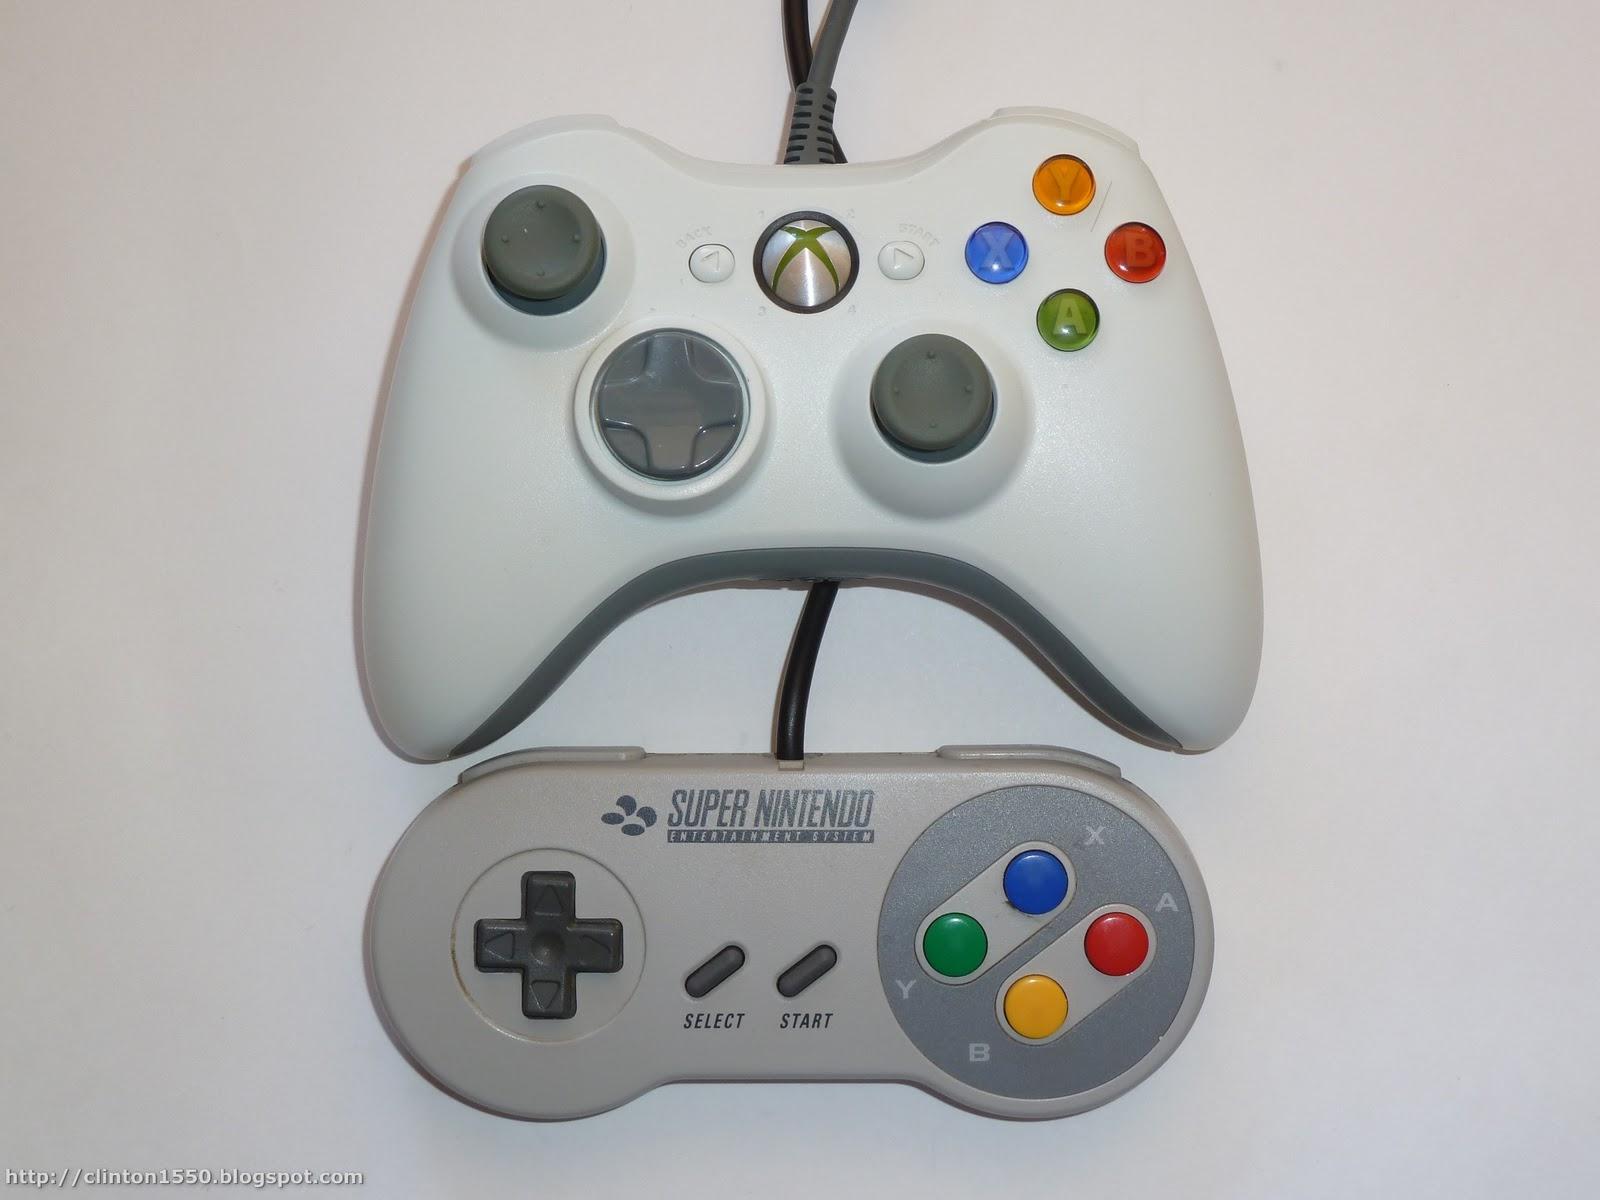 Retro Gaming: SNES on Mac OS X With a 360 Controller | clinton1550\'s ...